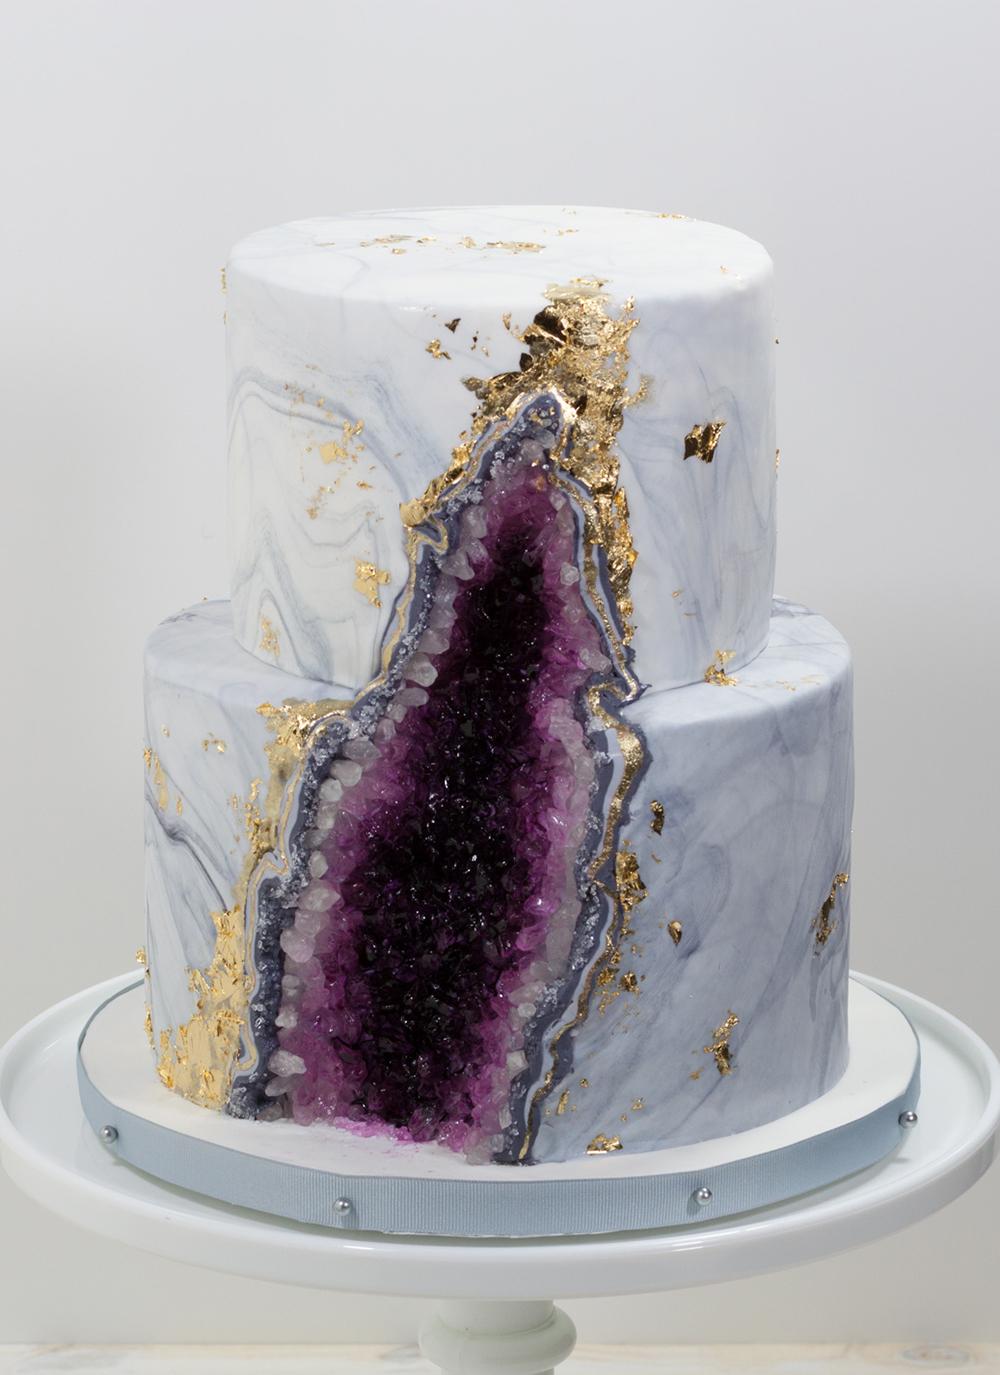 amethyst-geode-cake-whipped-bakeshop-detail-2